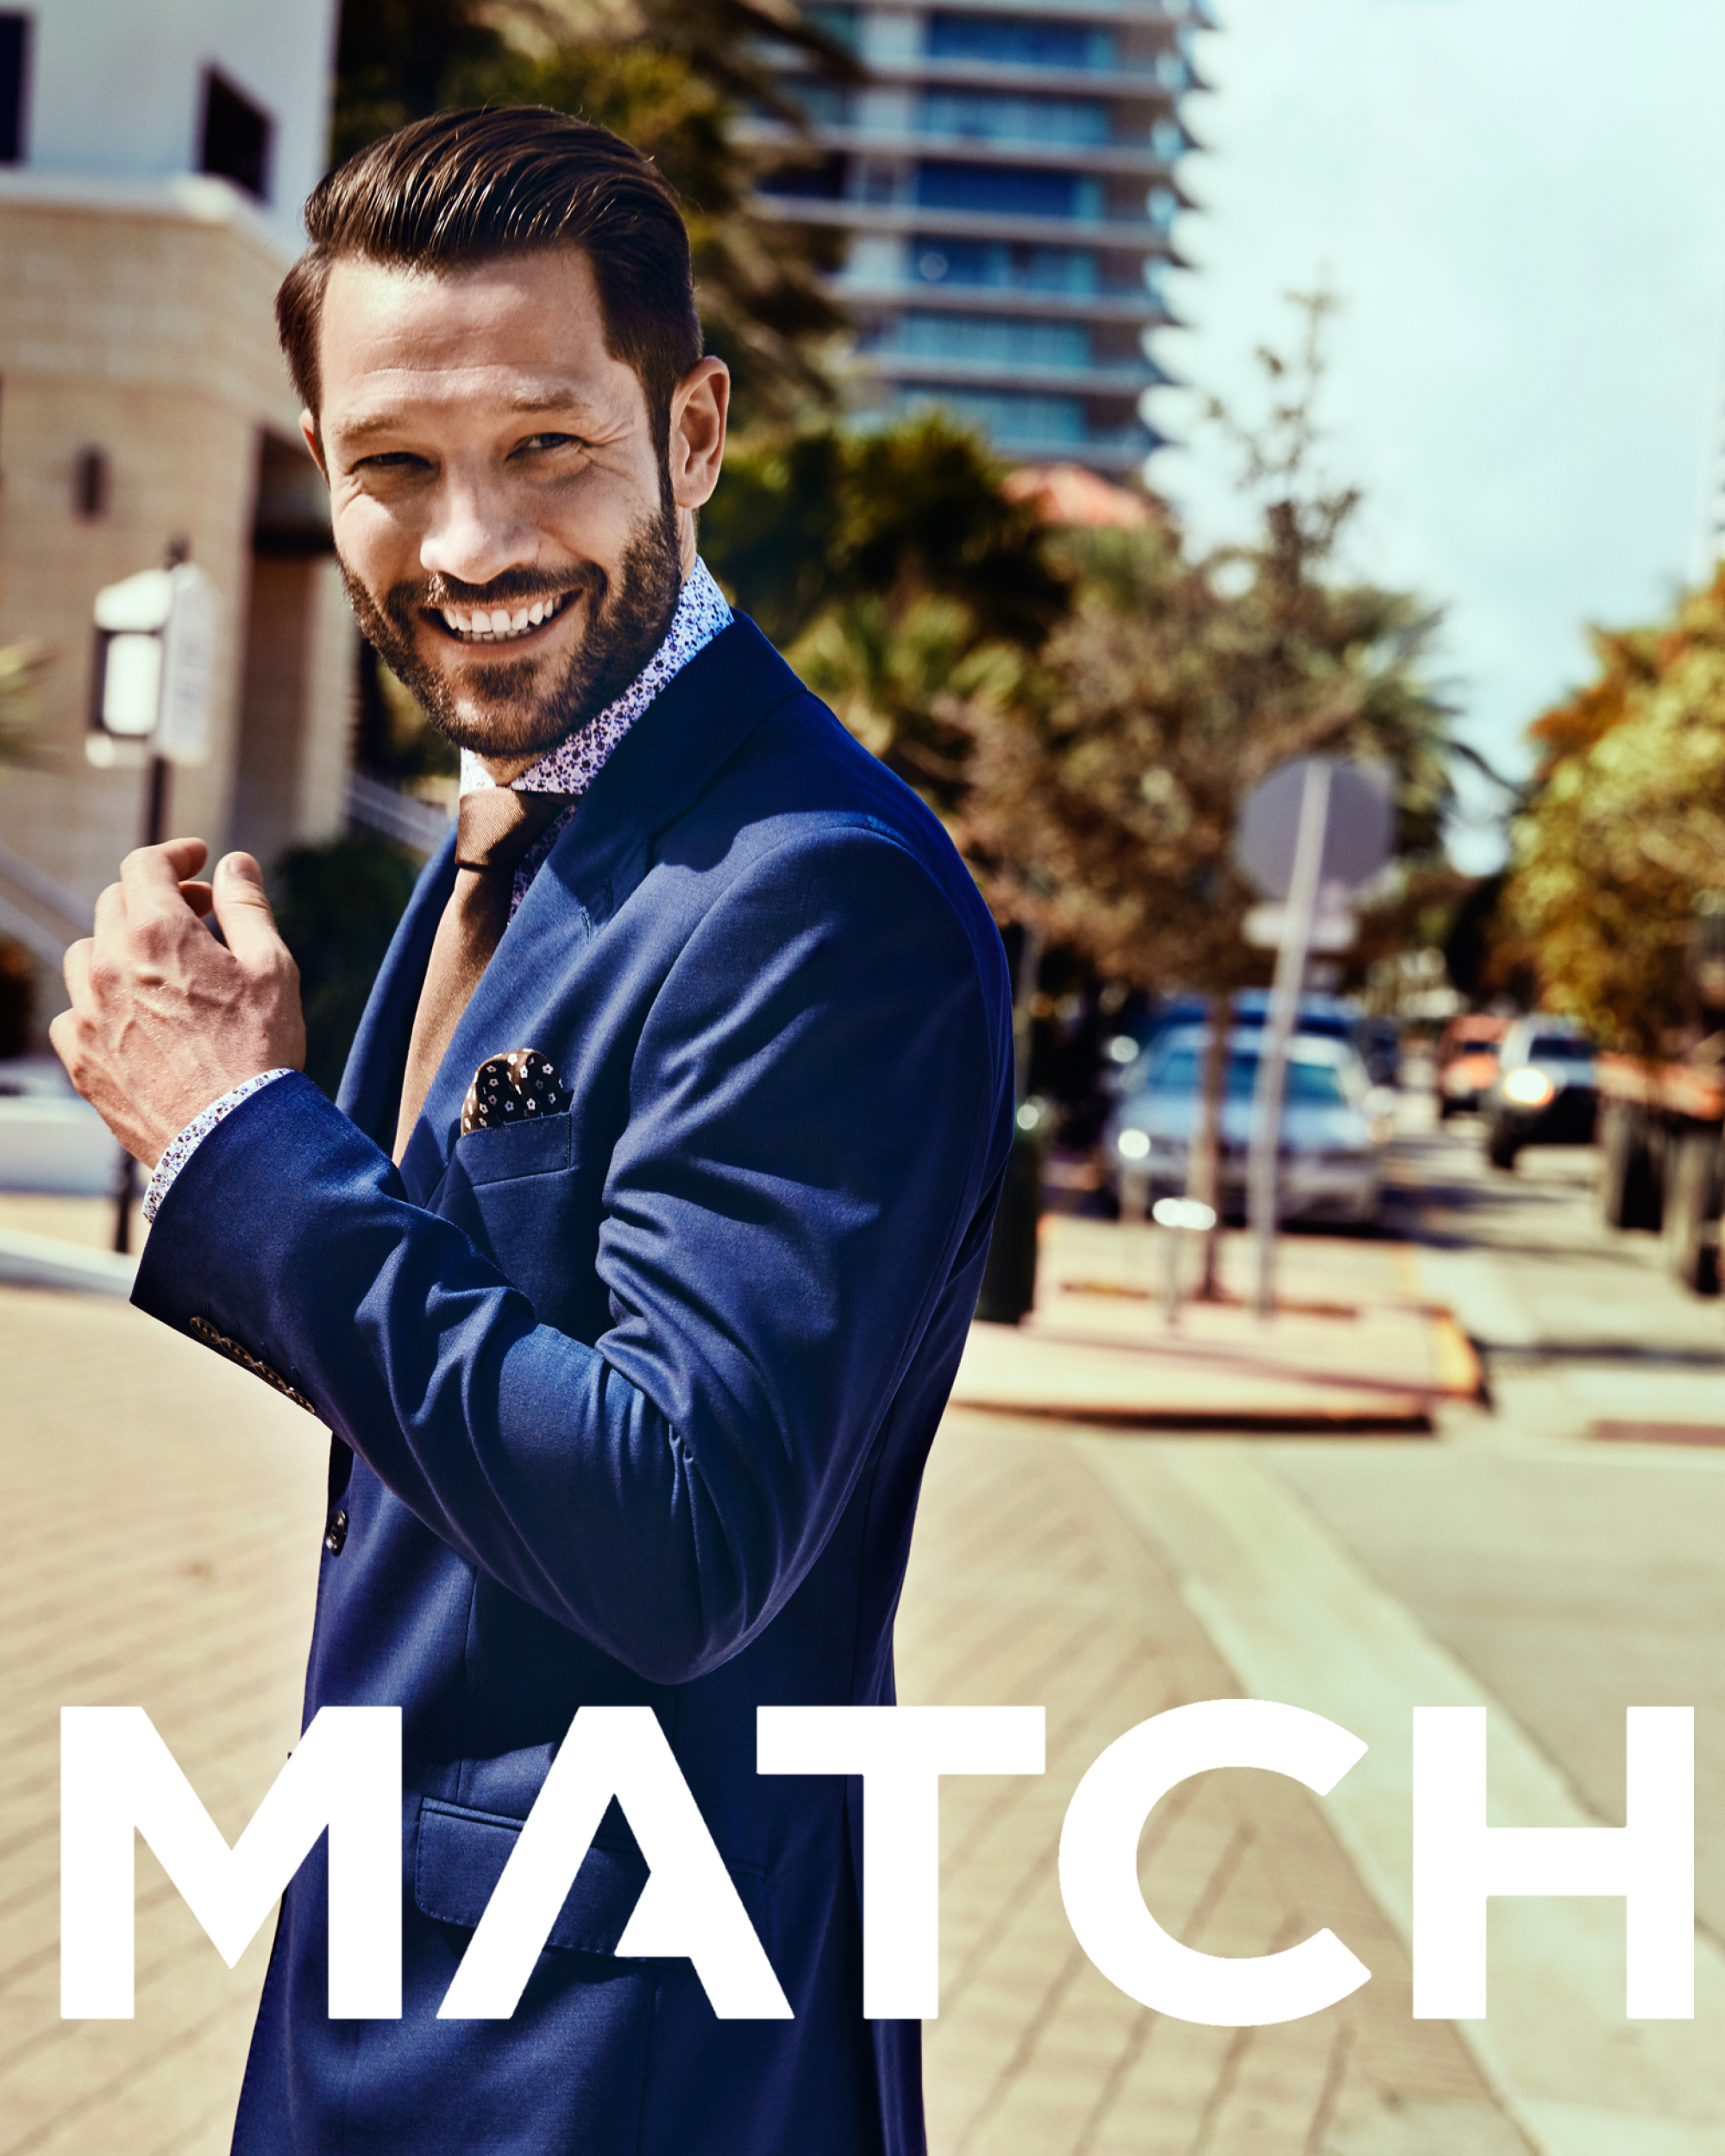 match8.jpg